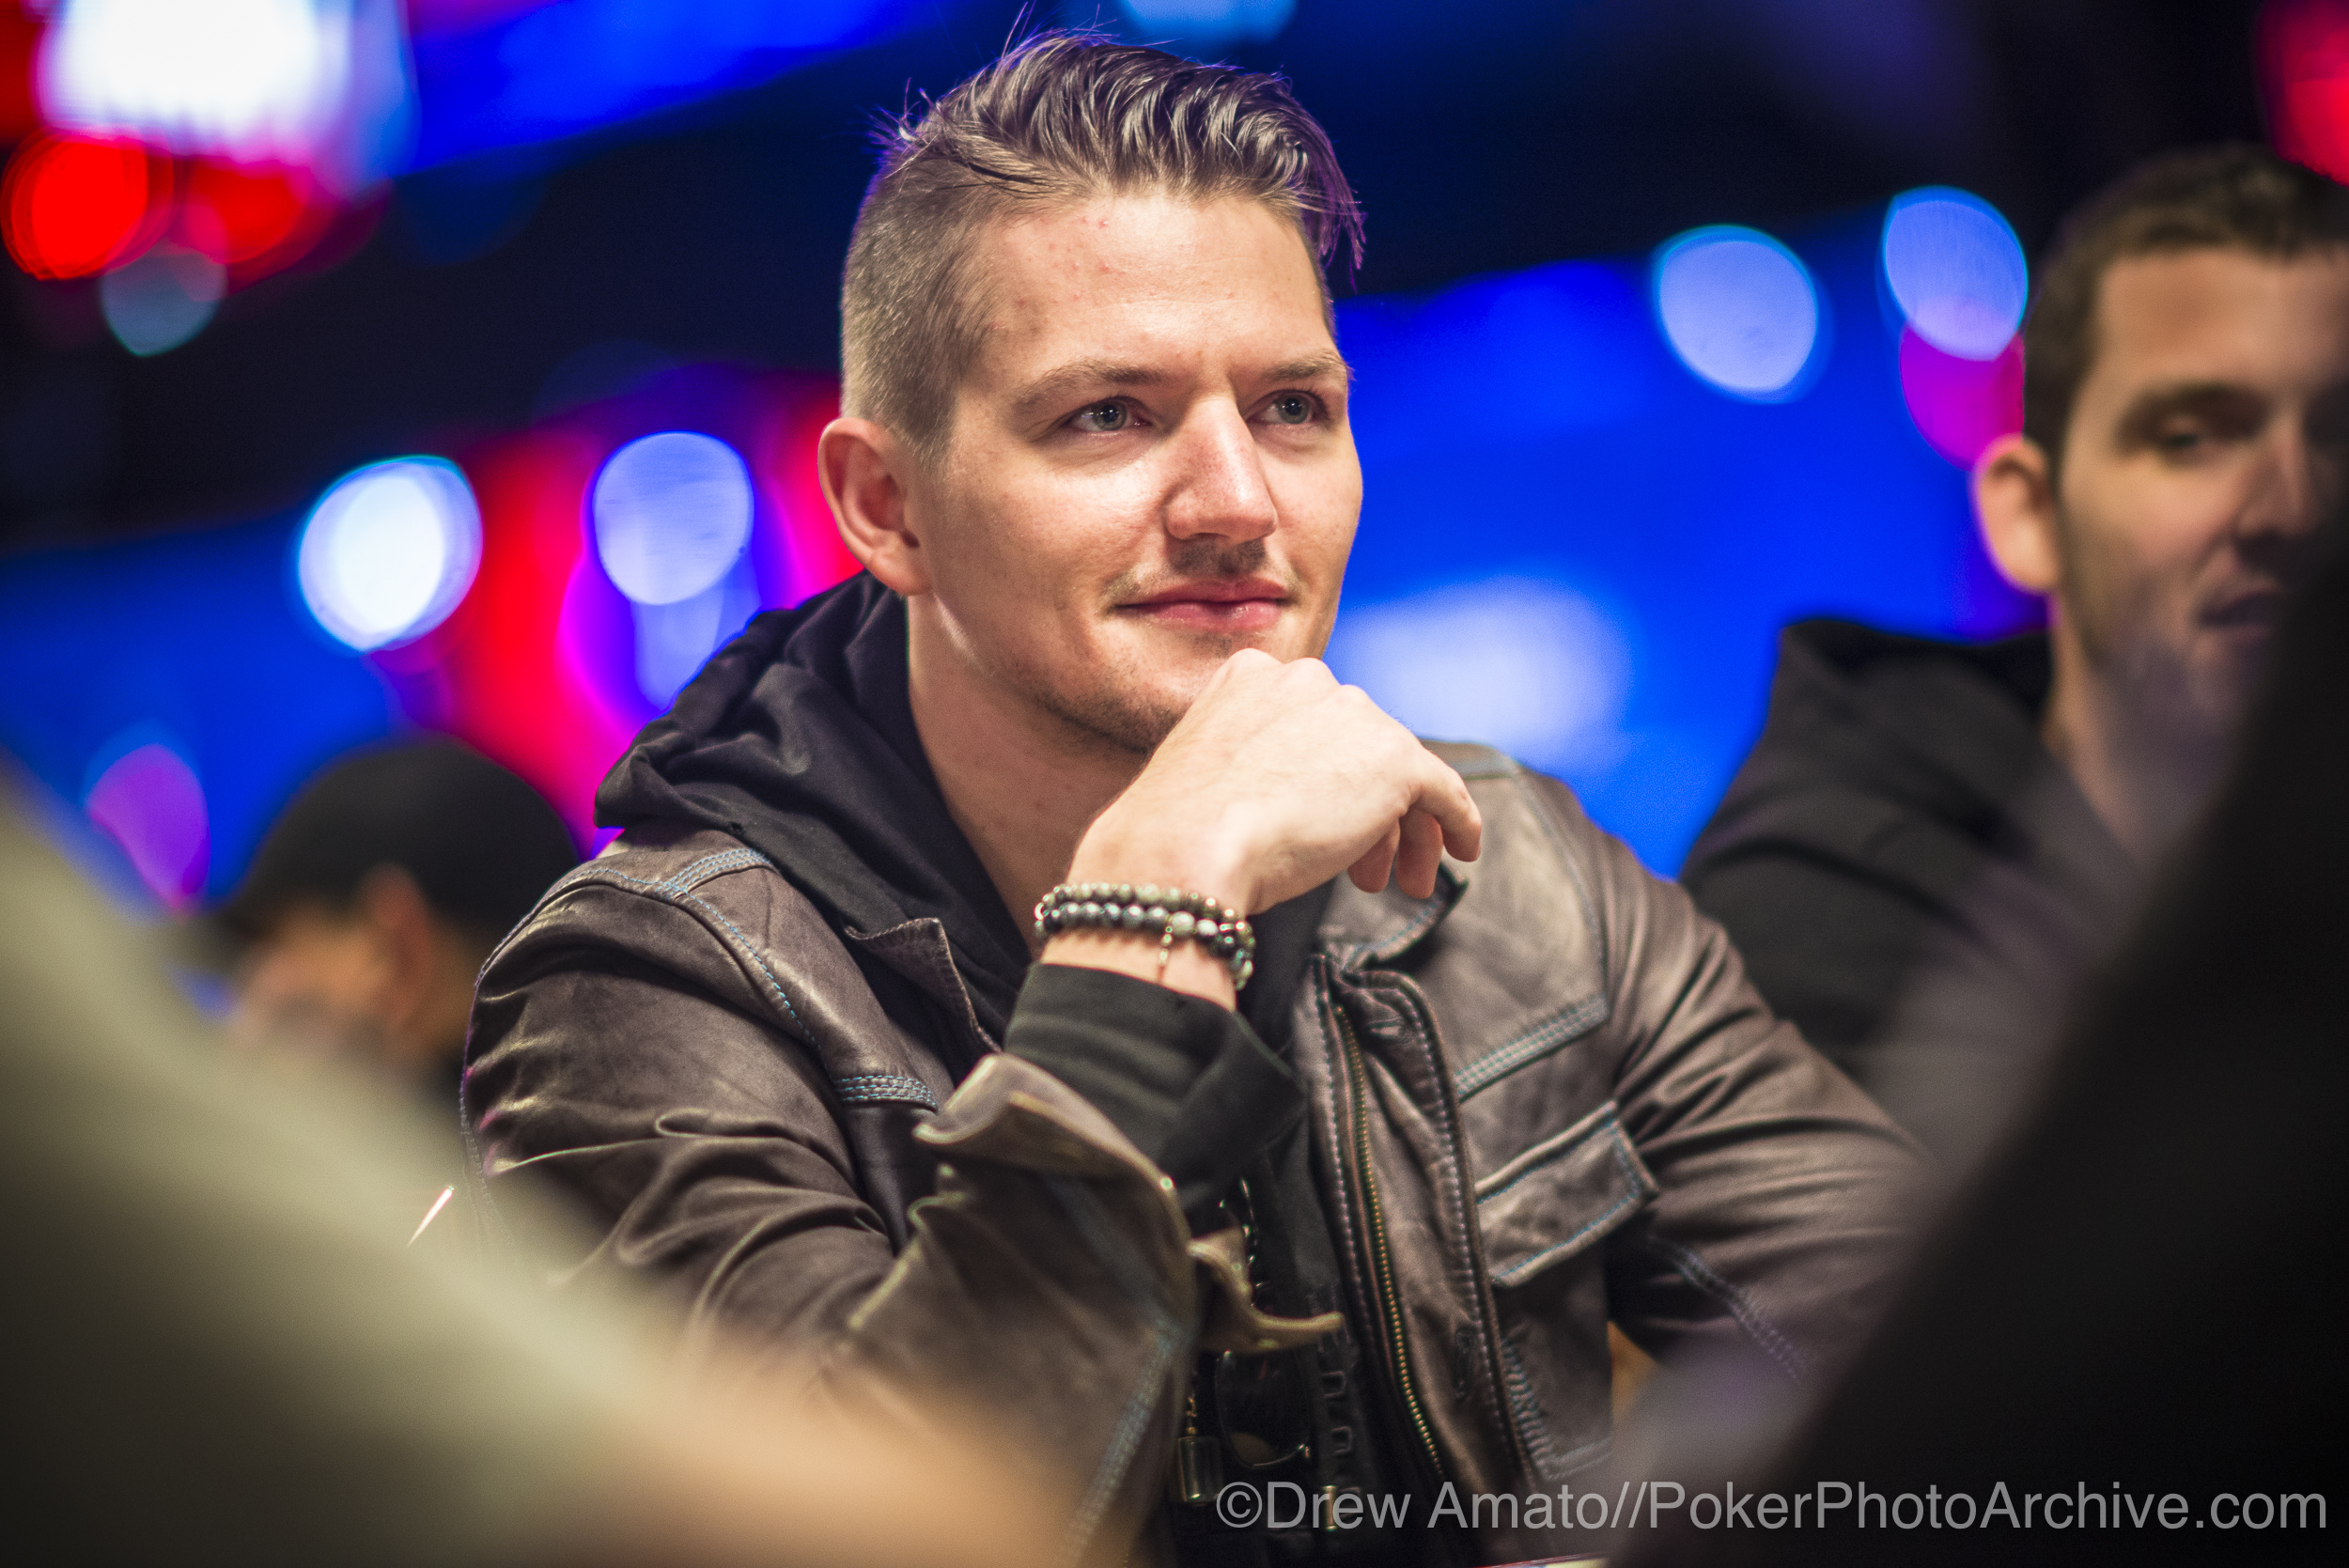 Joey Ingram_2017 WSOP_EV010_Day 3_Amato_DA60365.jpg